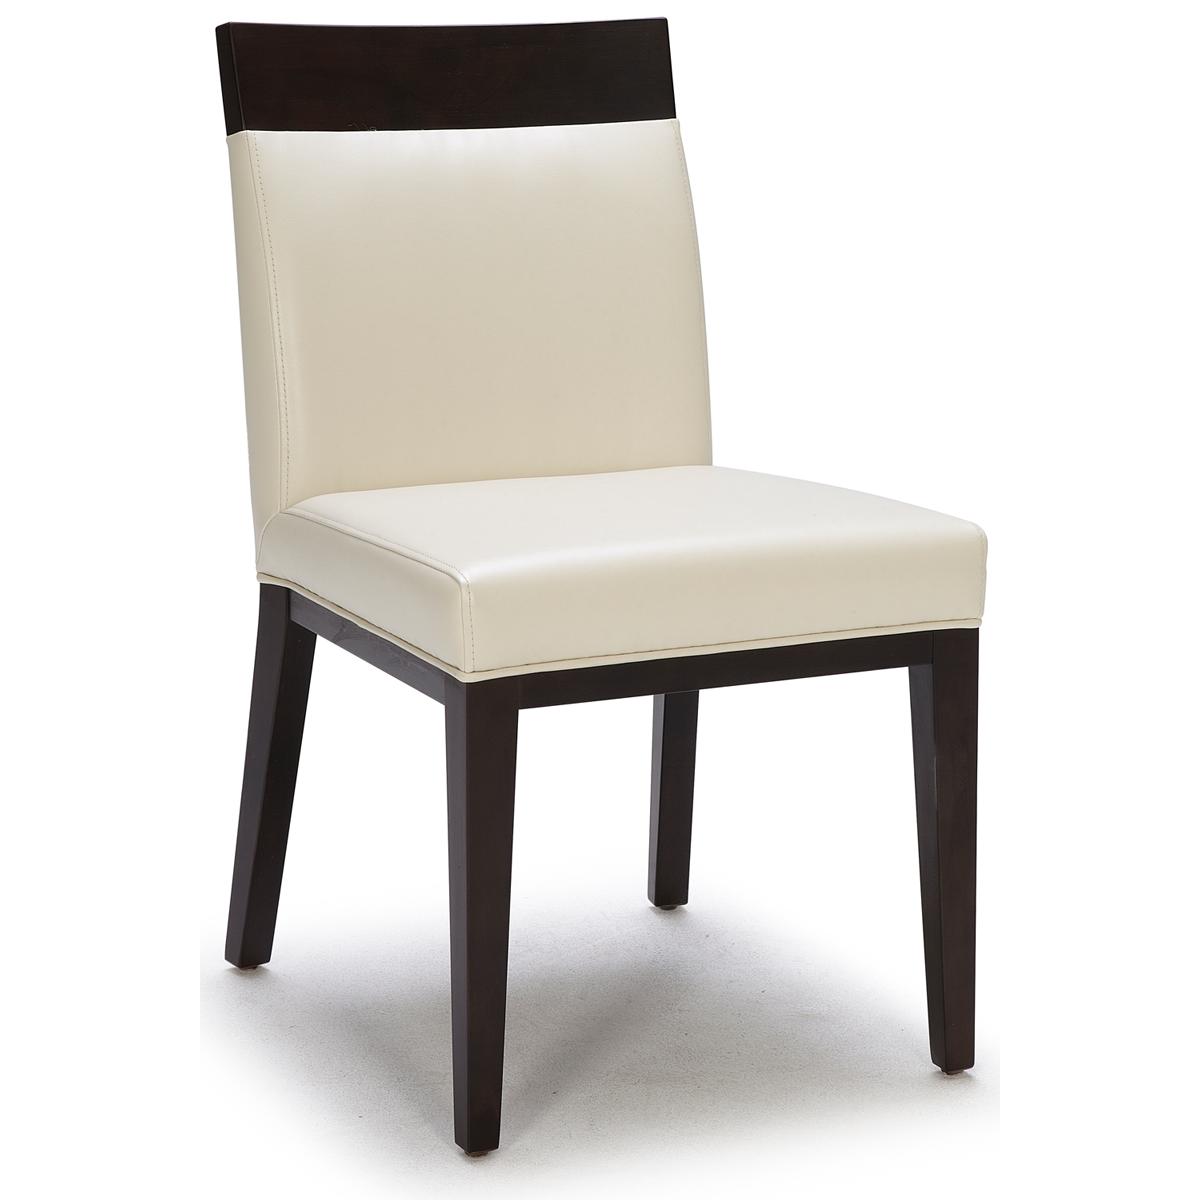 dark wood dining chairs. Dark Wood Dining Chairs I